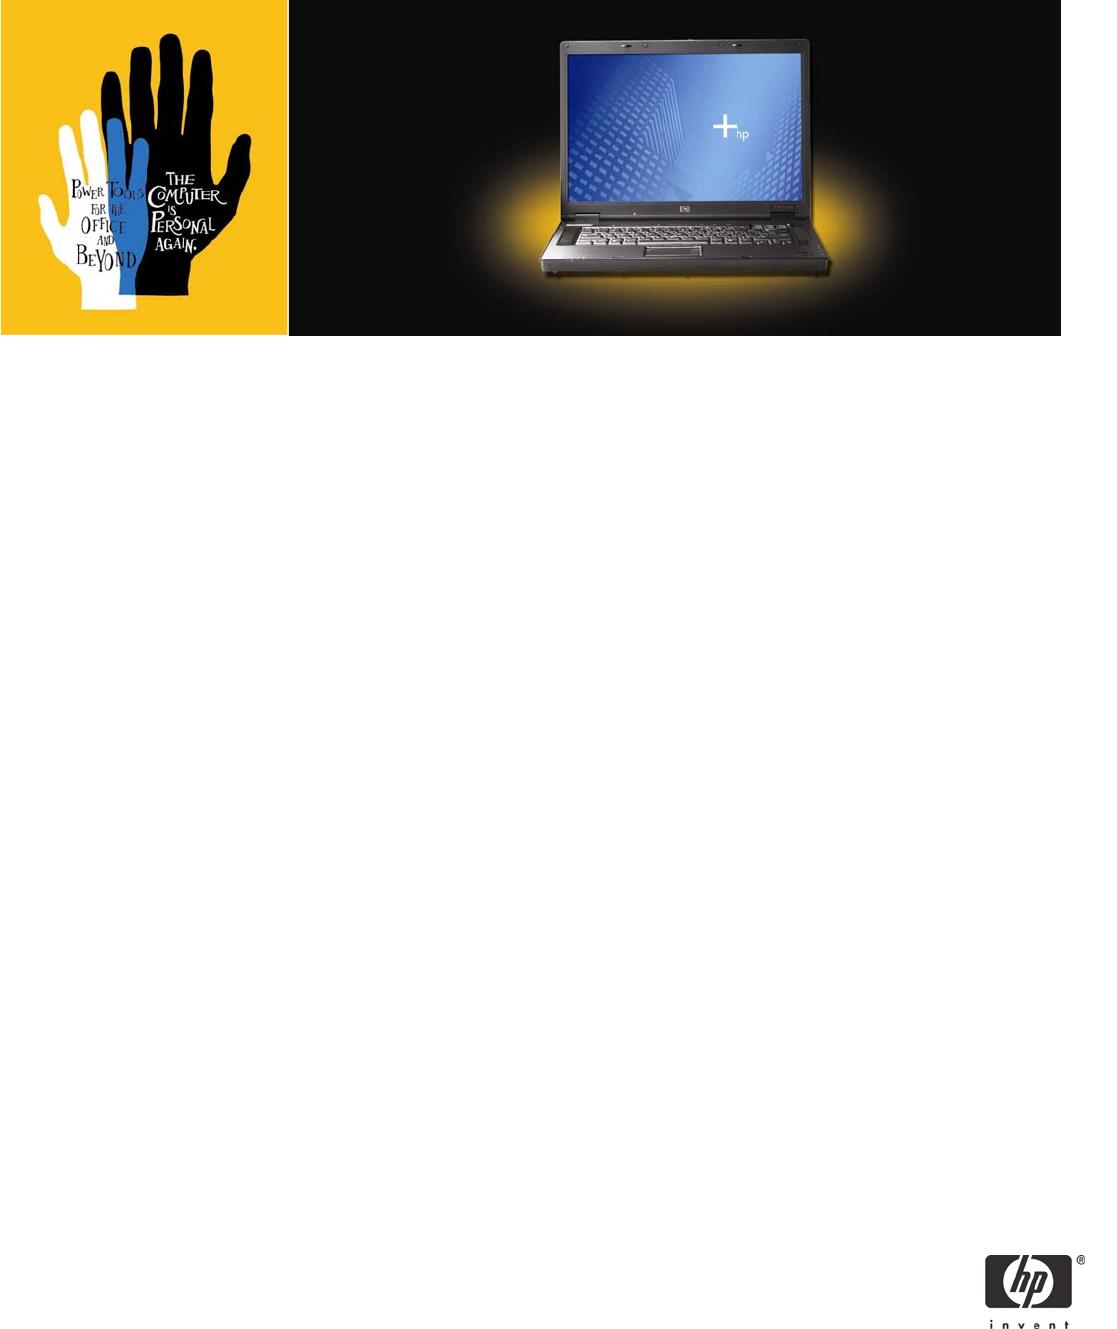 HP COMPAQ NX8420 NOTEBOOK MODEM WINDOWS 10 DRIVERS DOWNLOAD